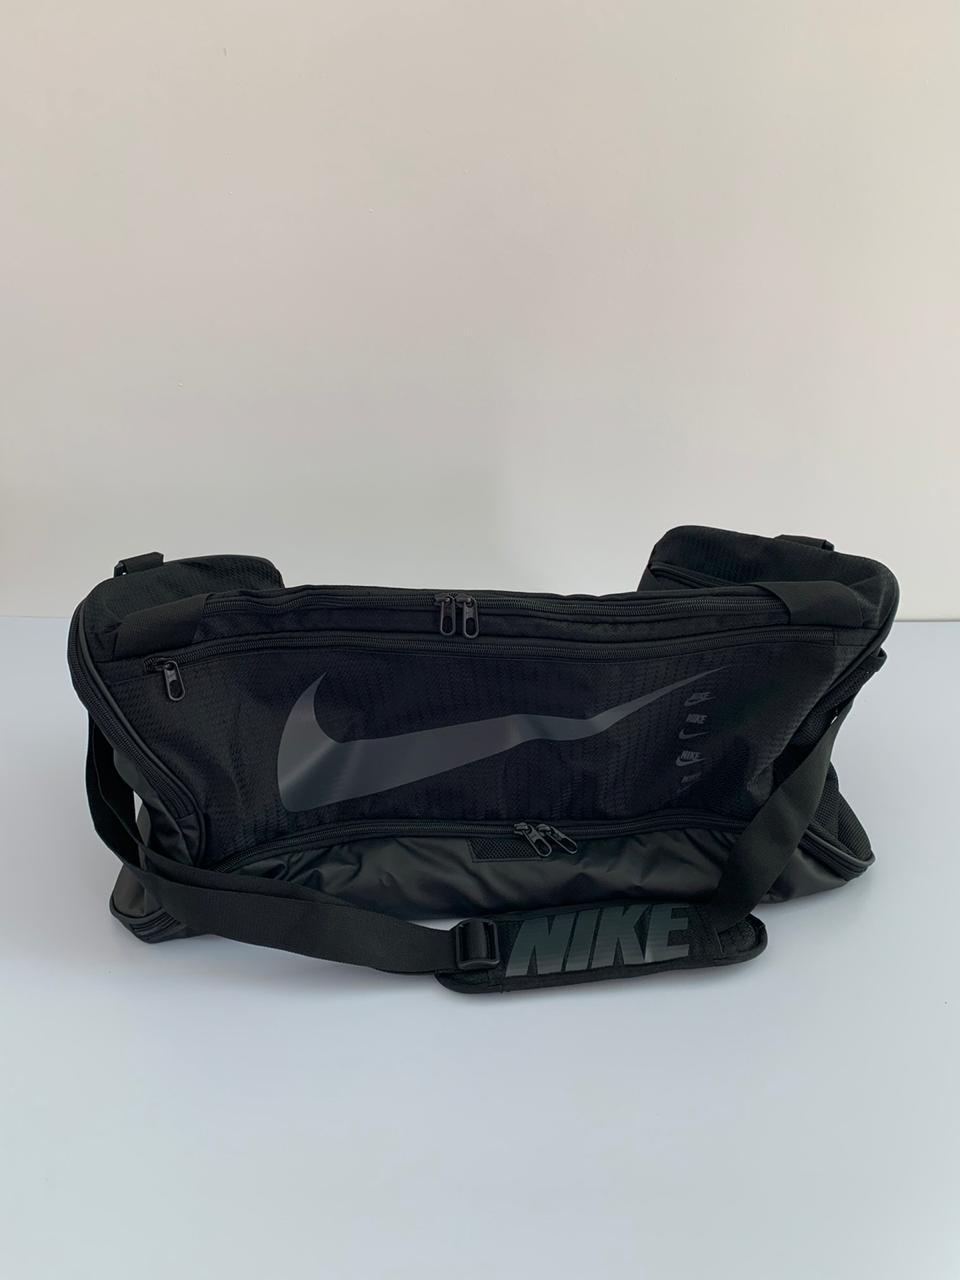 Anillo duro Bolsa fuga de la prisión  Bolsa Nike - 60 litros - Allfit - Tudo para Crossfit